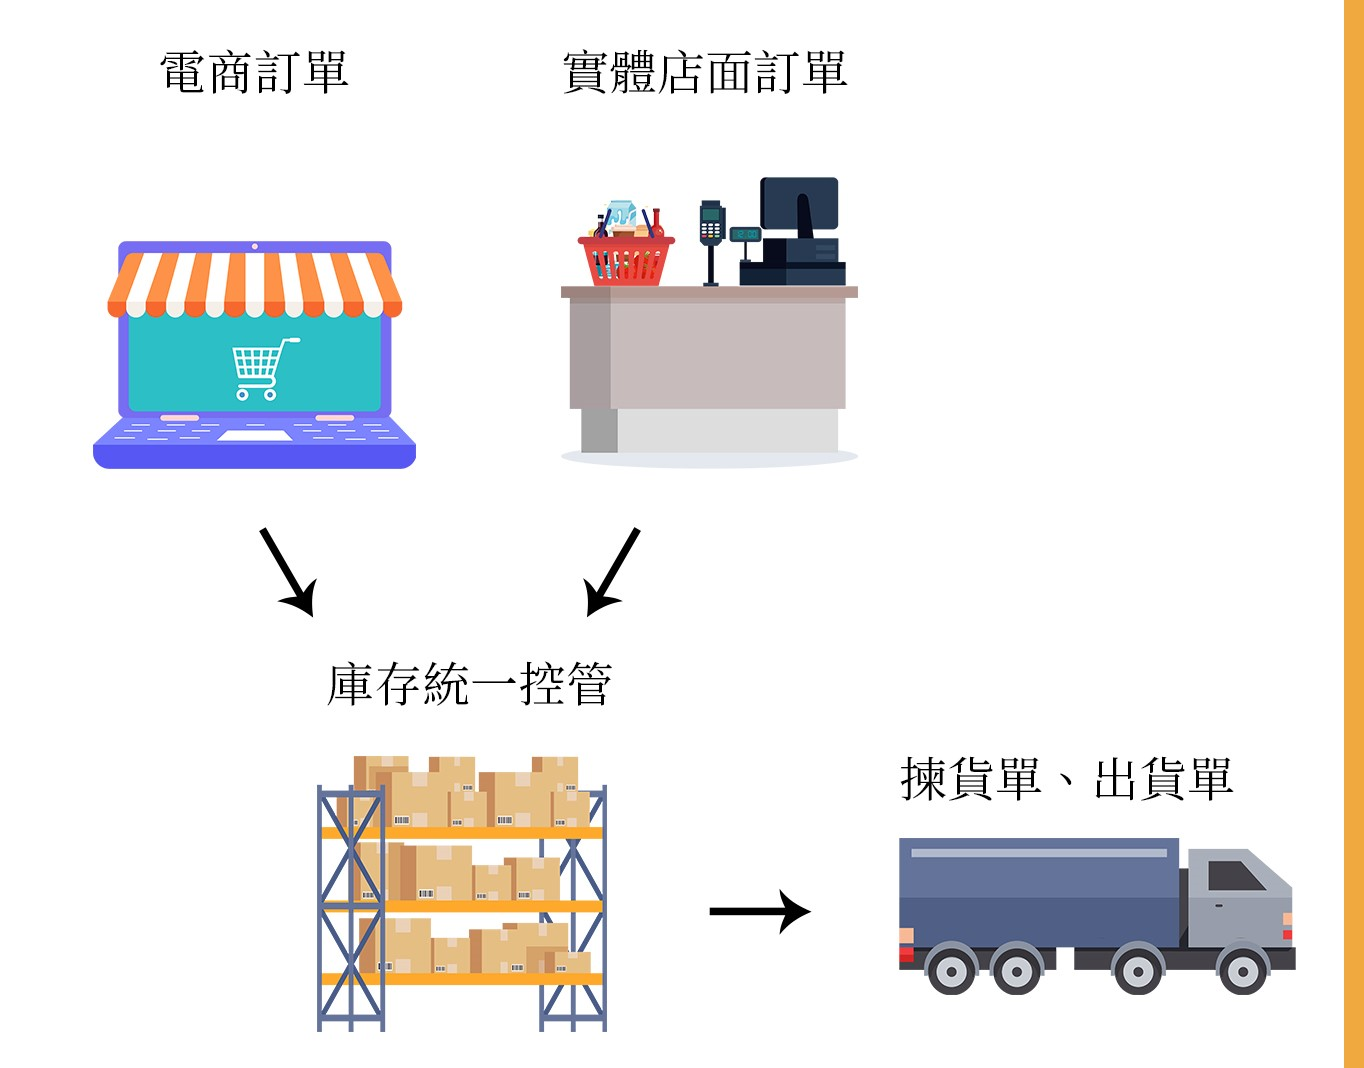 ERP for 購物商城文案 5